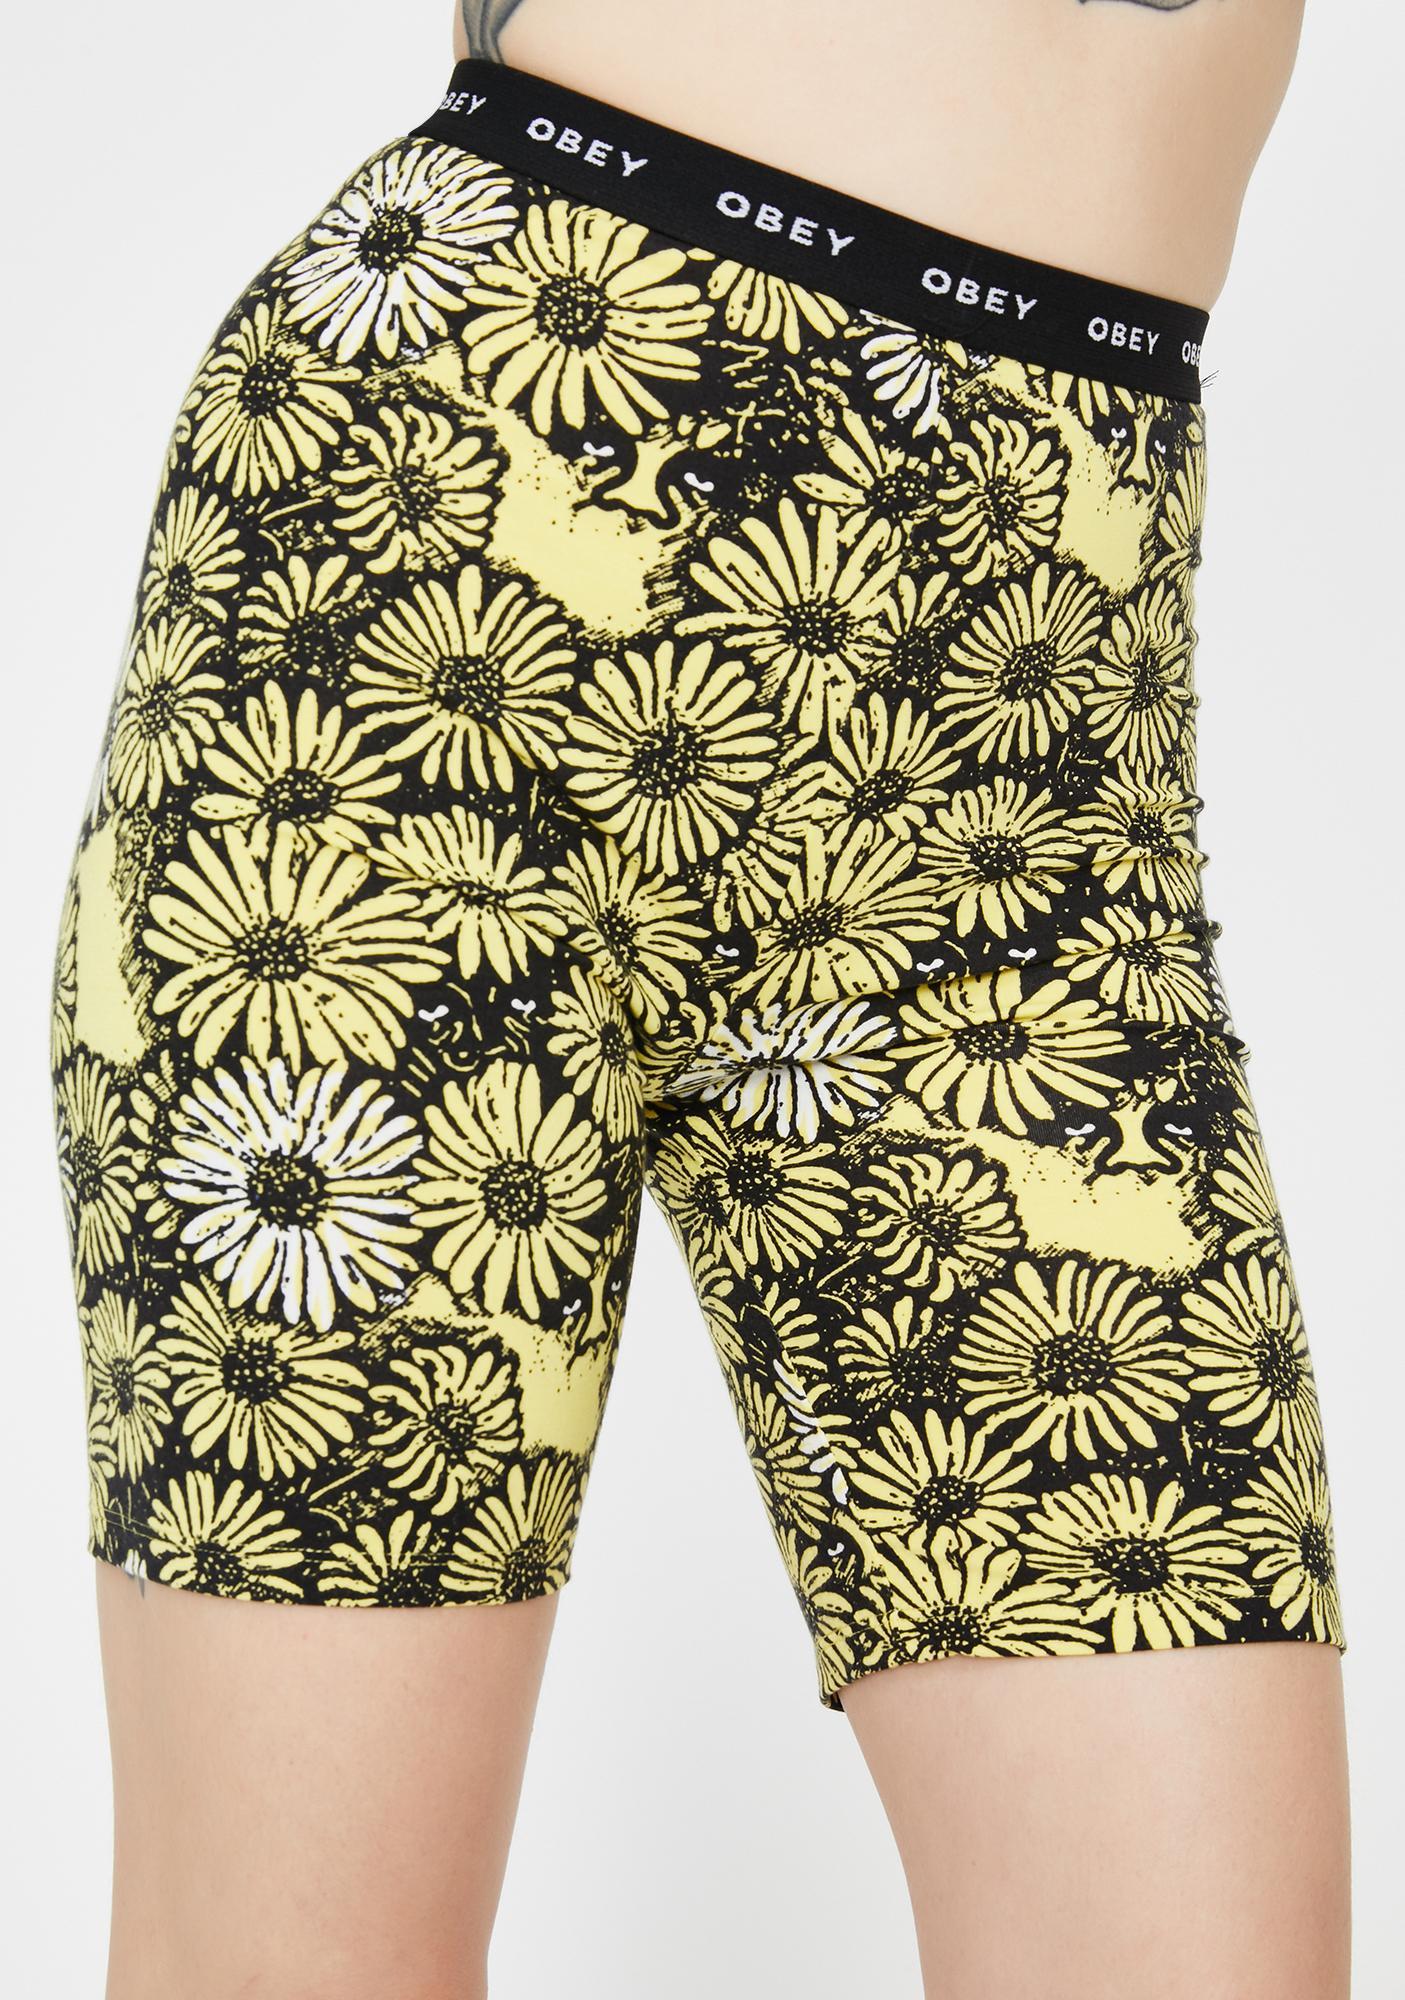 Obey Uptown Biker Shorts